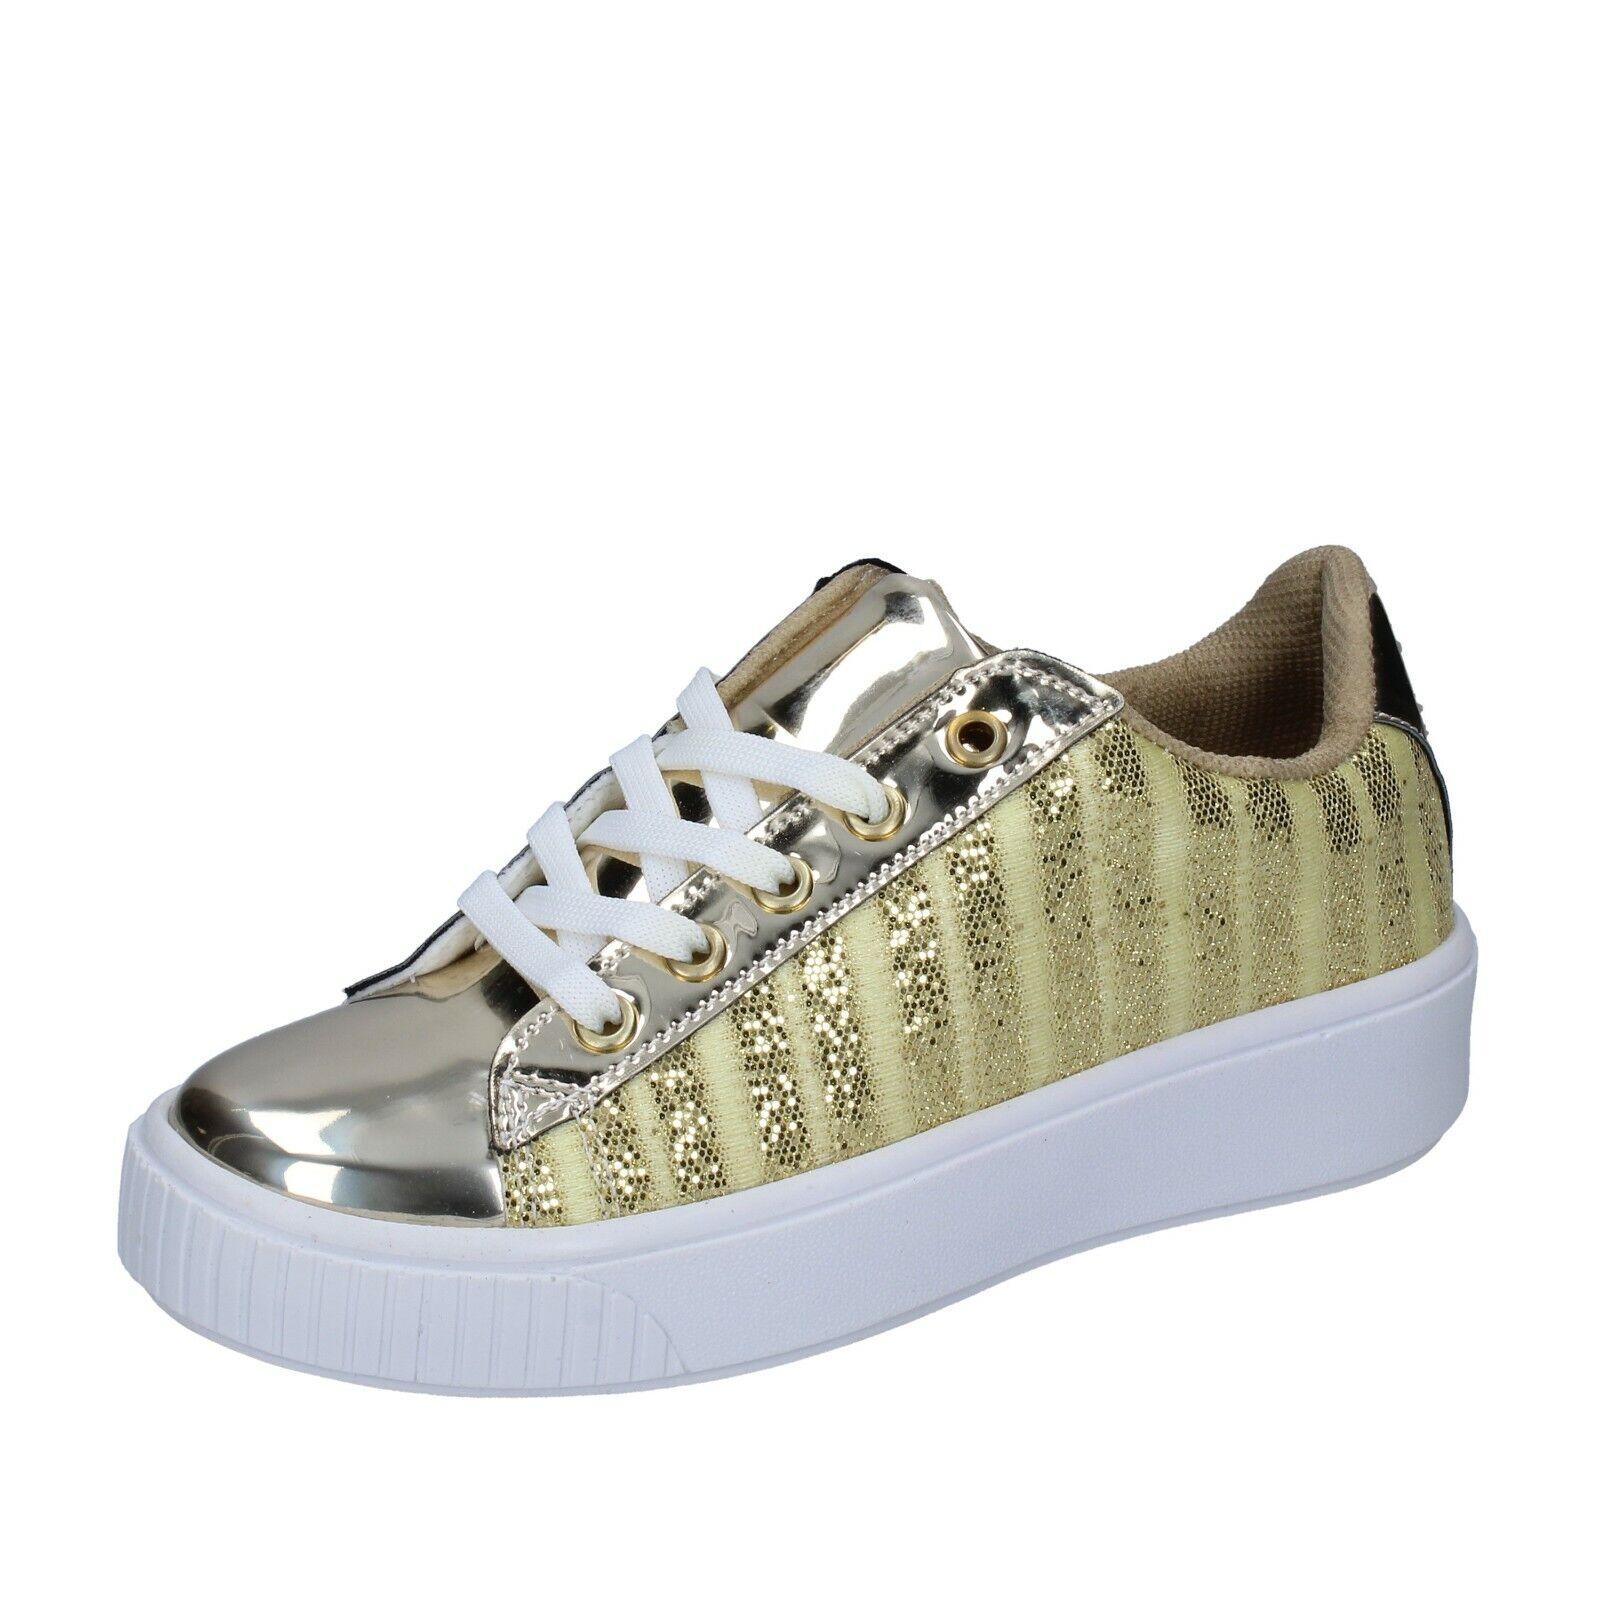 womens shoes LANCETTI 6 sneakers gold textile BP557-39 EU 39